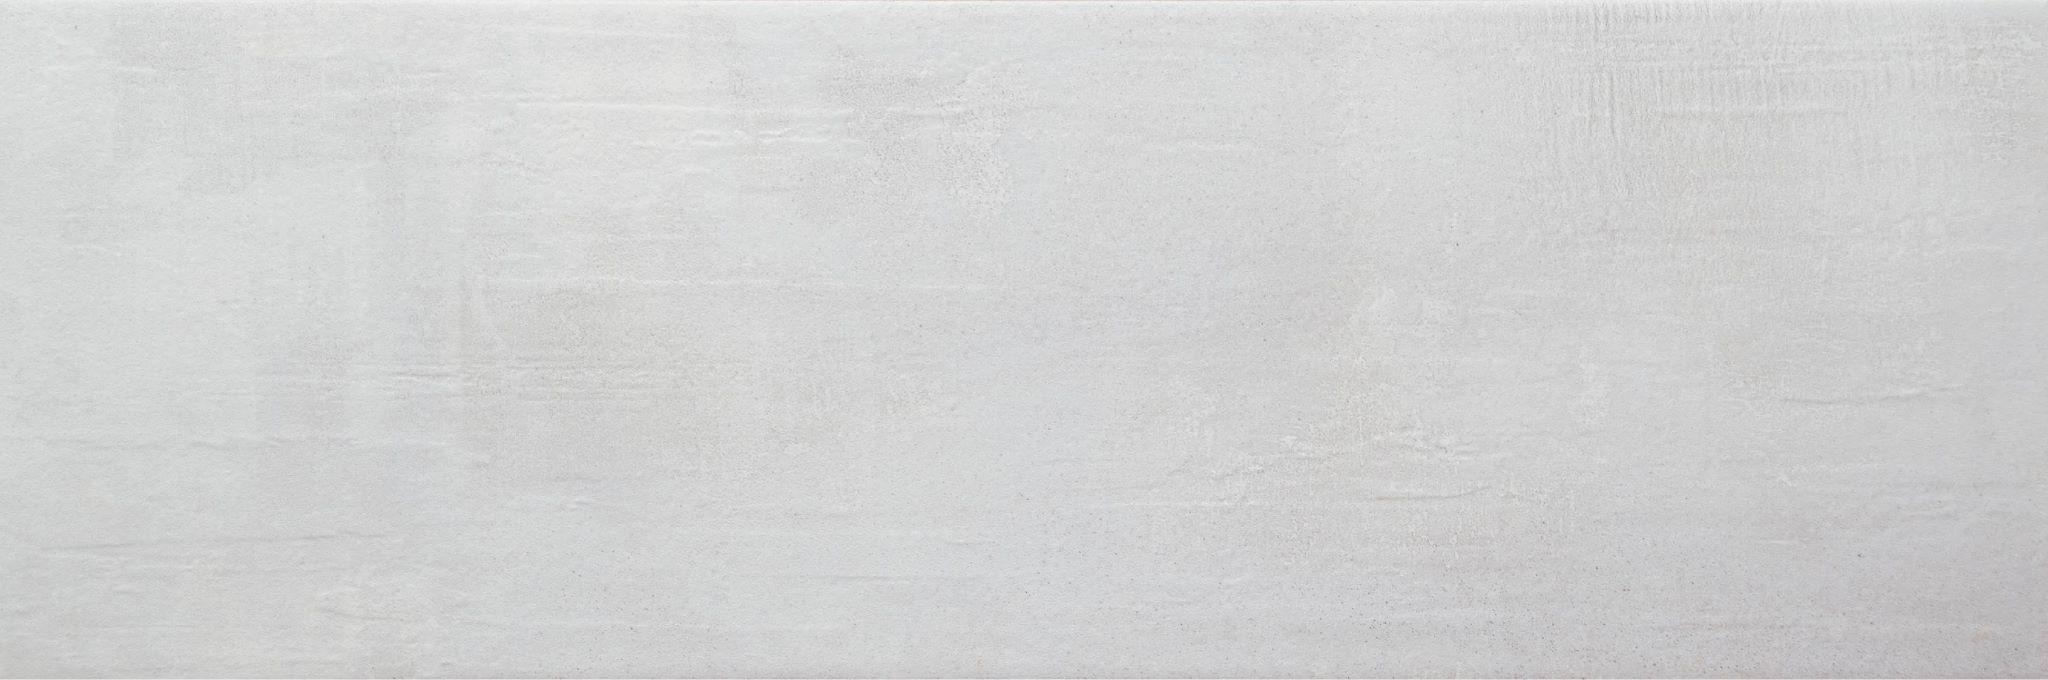 Casale pearl 146202 20x60 - Hansas Plaadimaailm